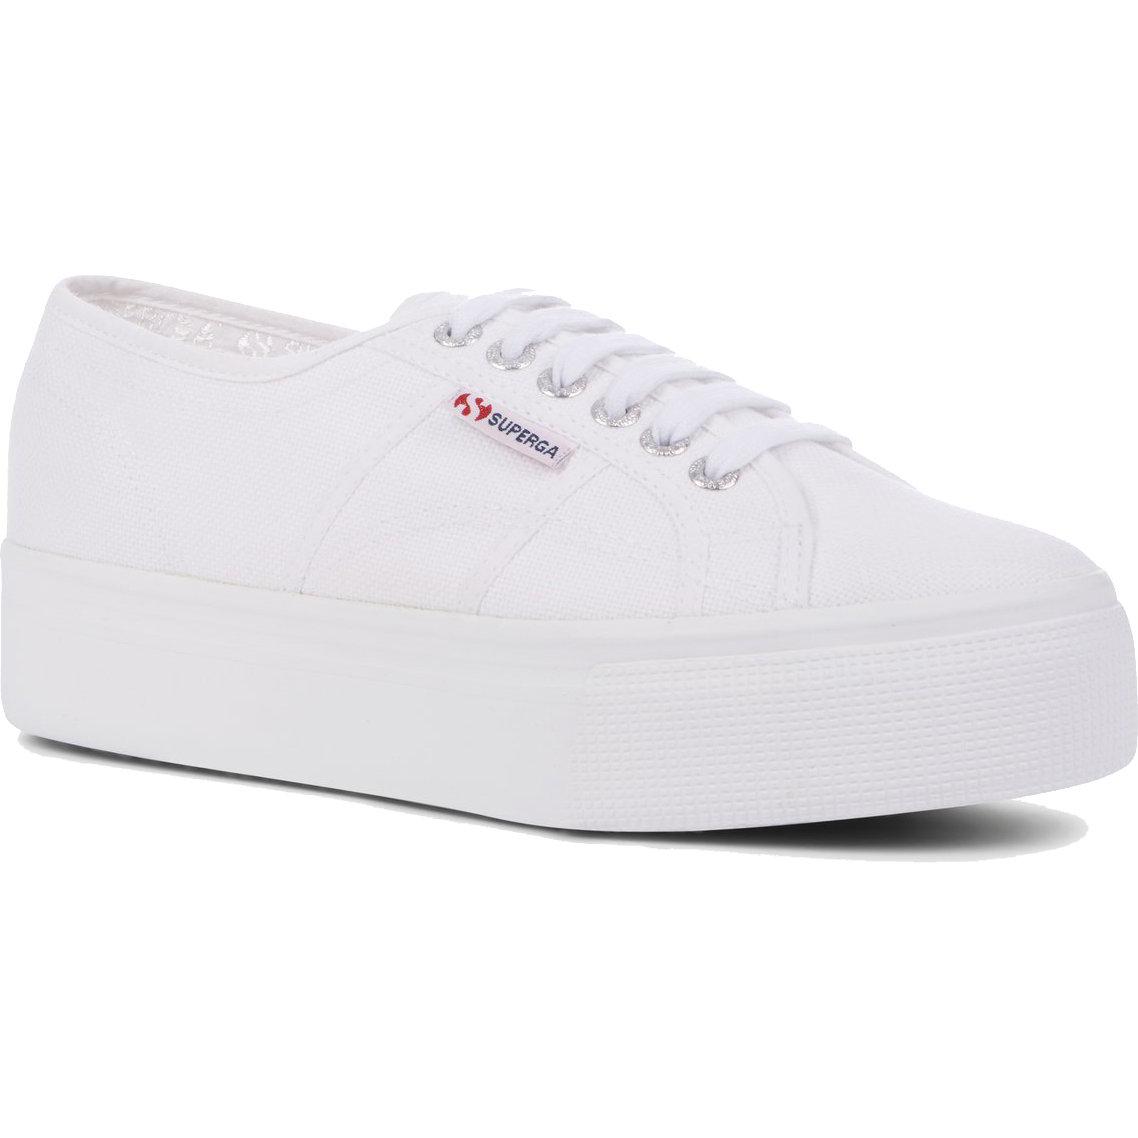 Superga Womens 2790 Linea Chunky Platform Trainers Shoes - White